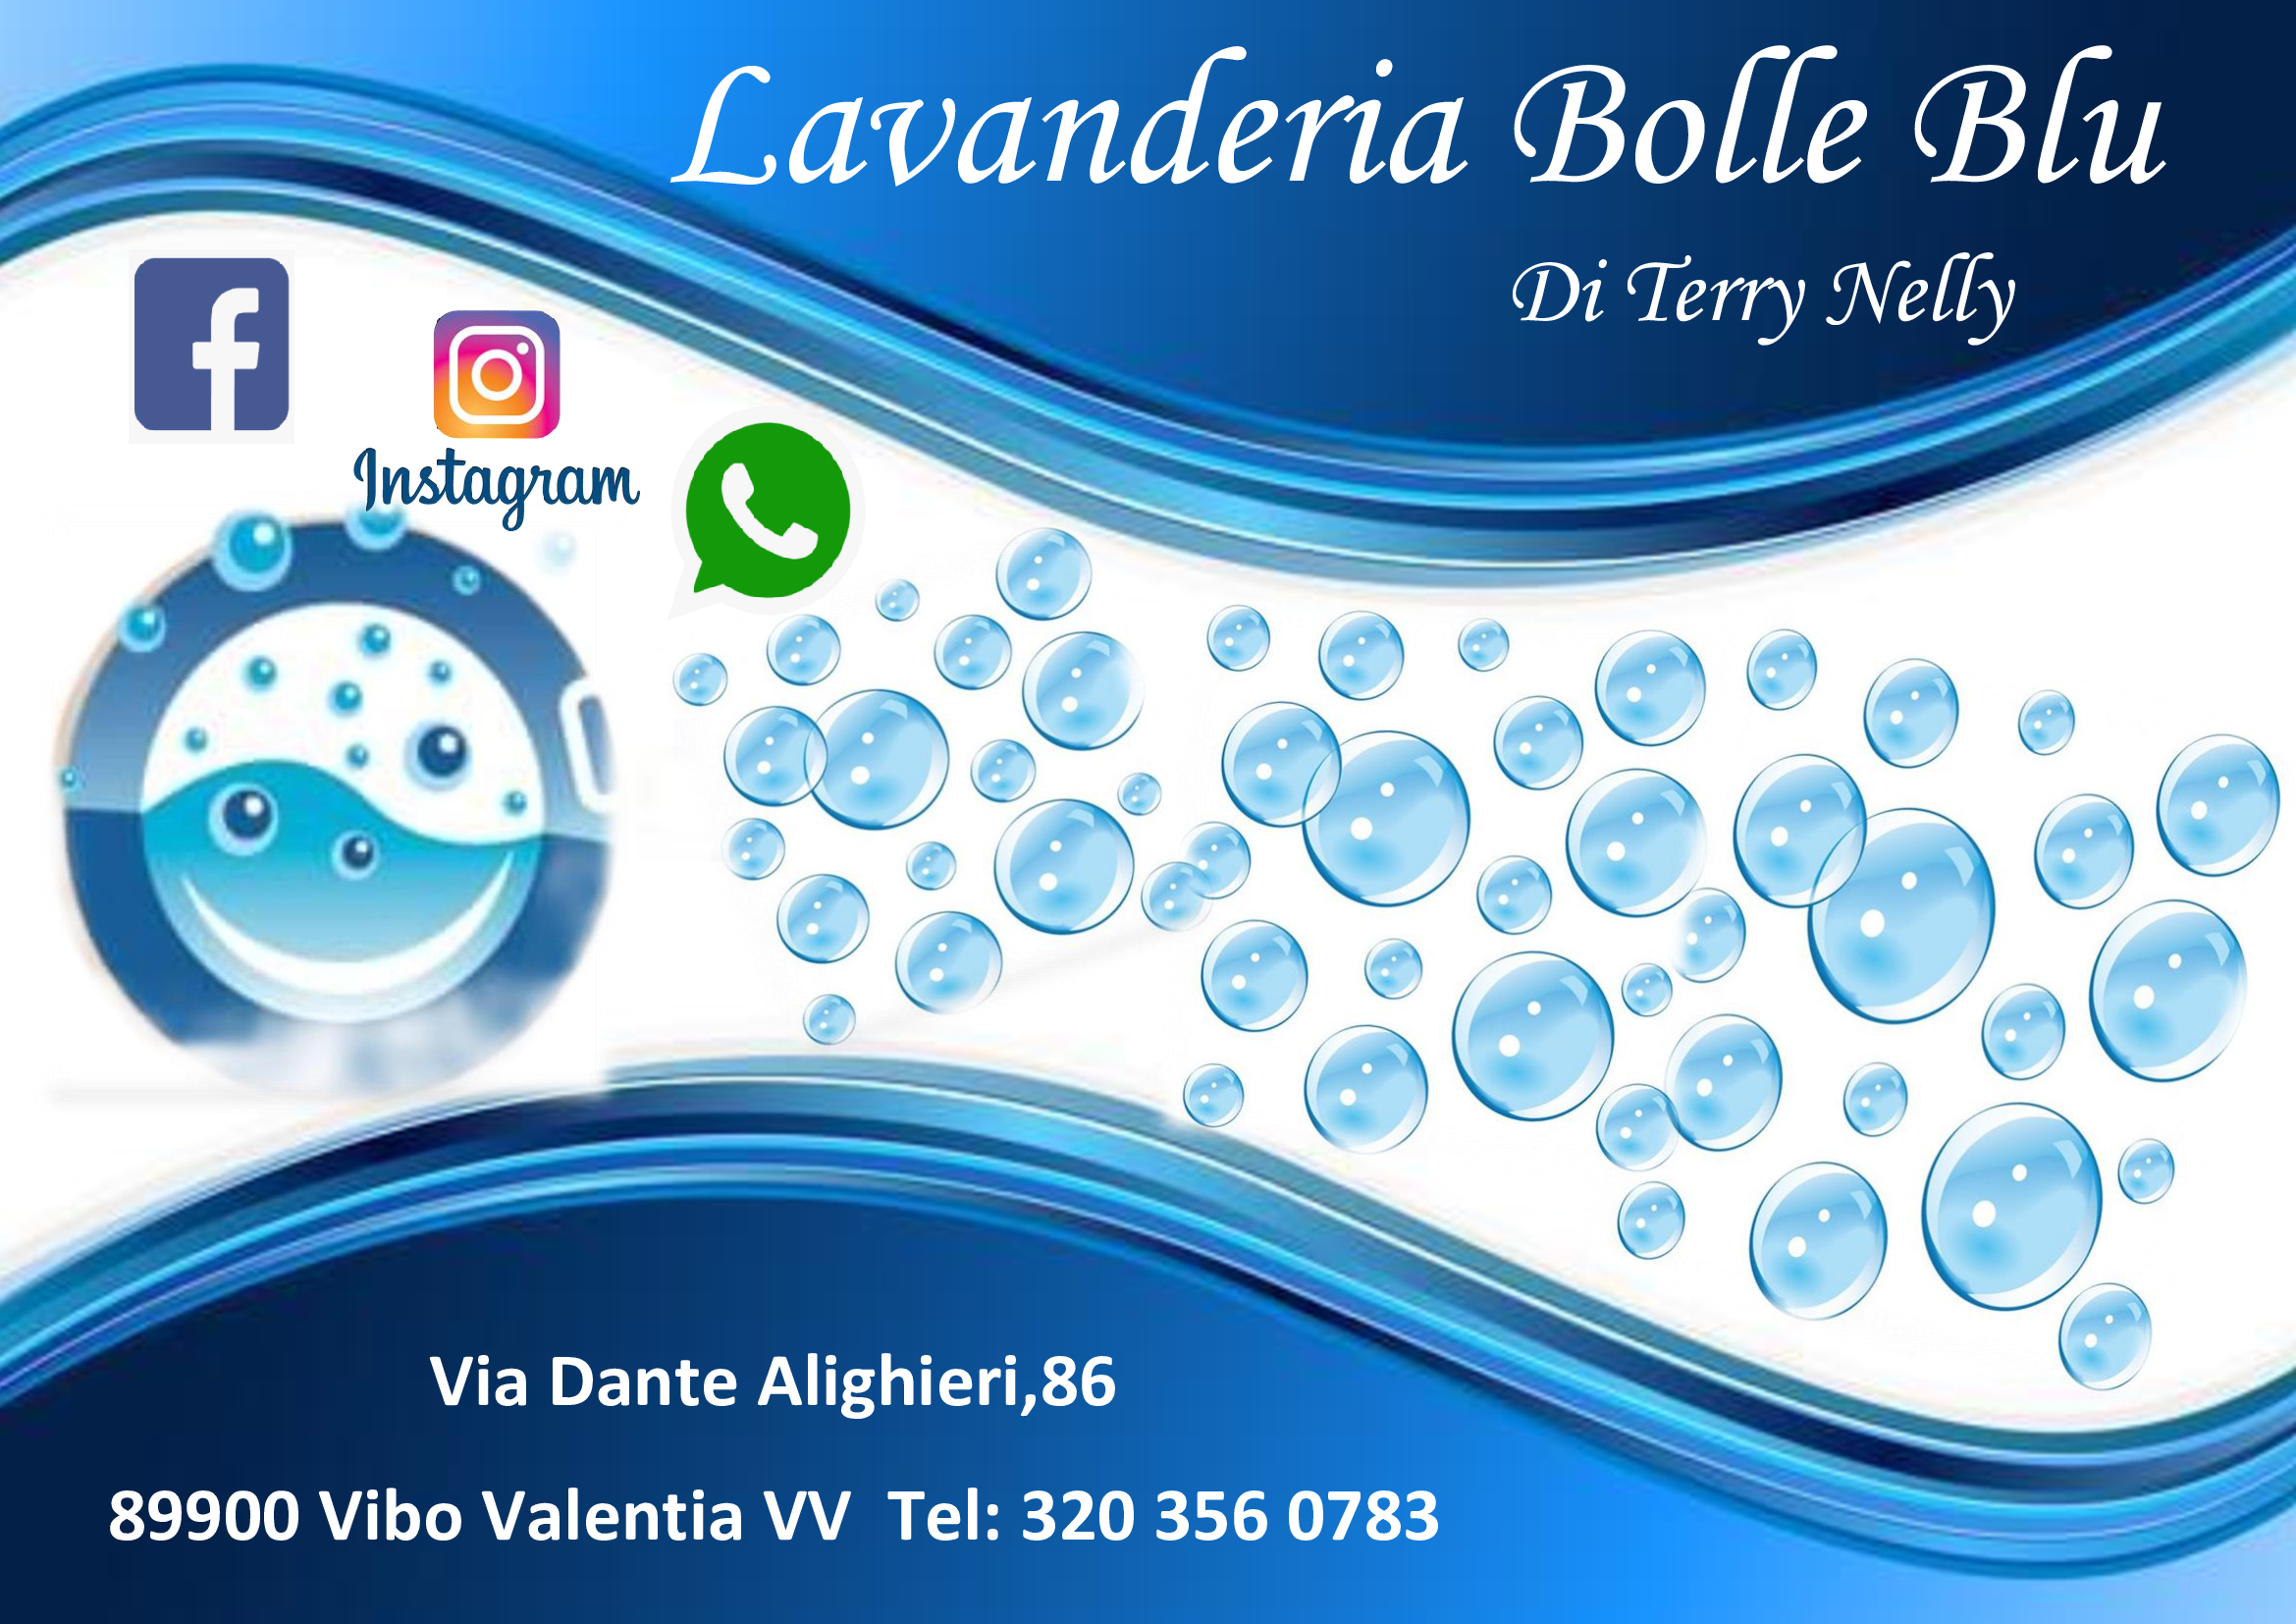 LOGO-LAVANDERIA-BOLLE-BLU-2 (1)